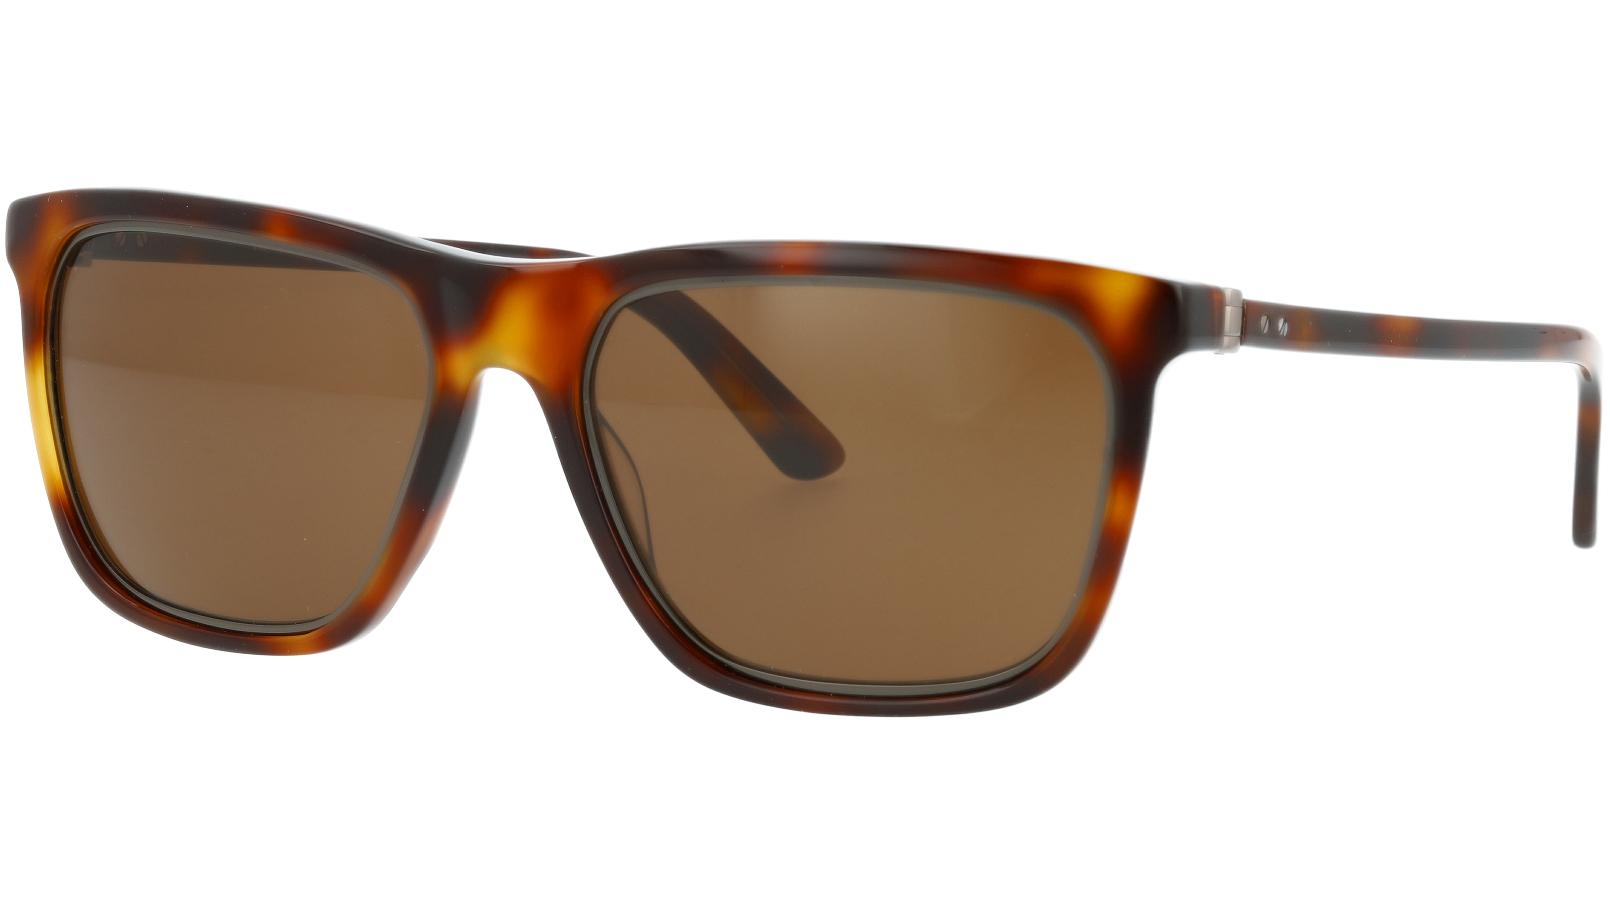 CALVIN KLEIN CK8502S 218 55 SOFT Sunglasses